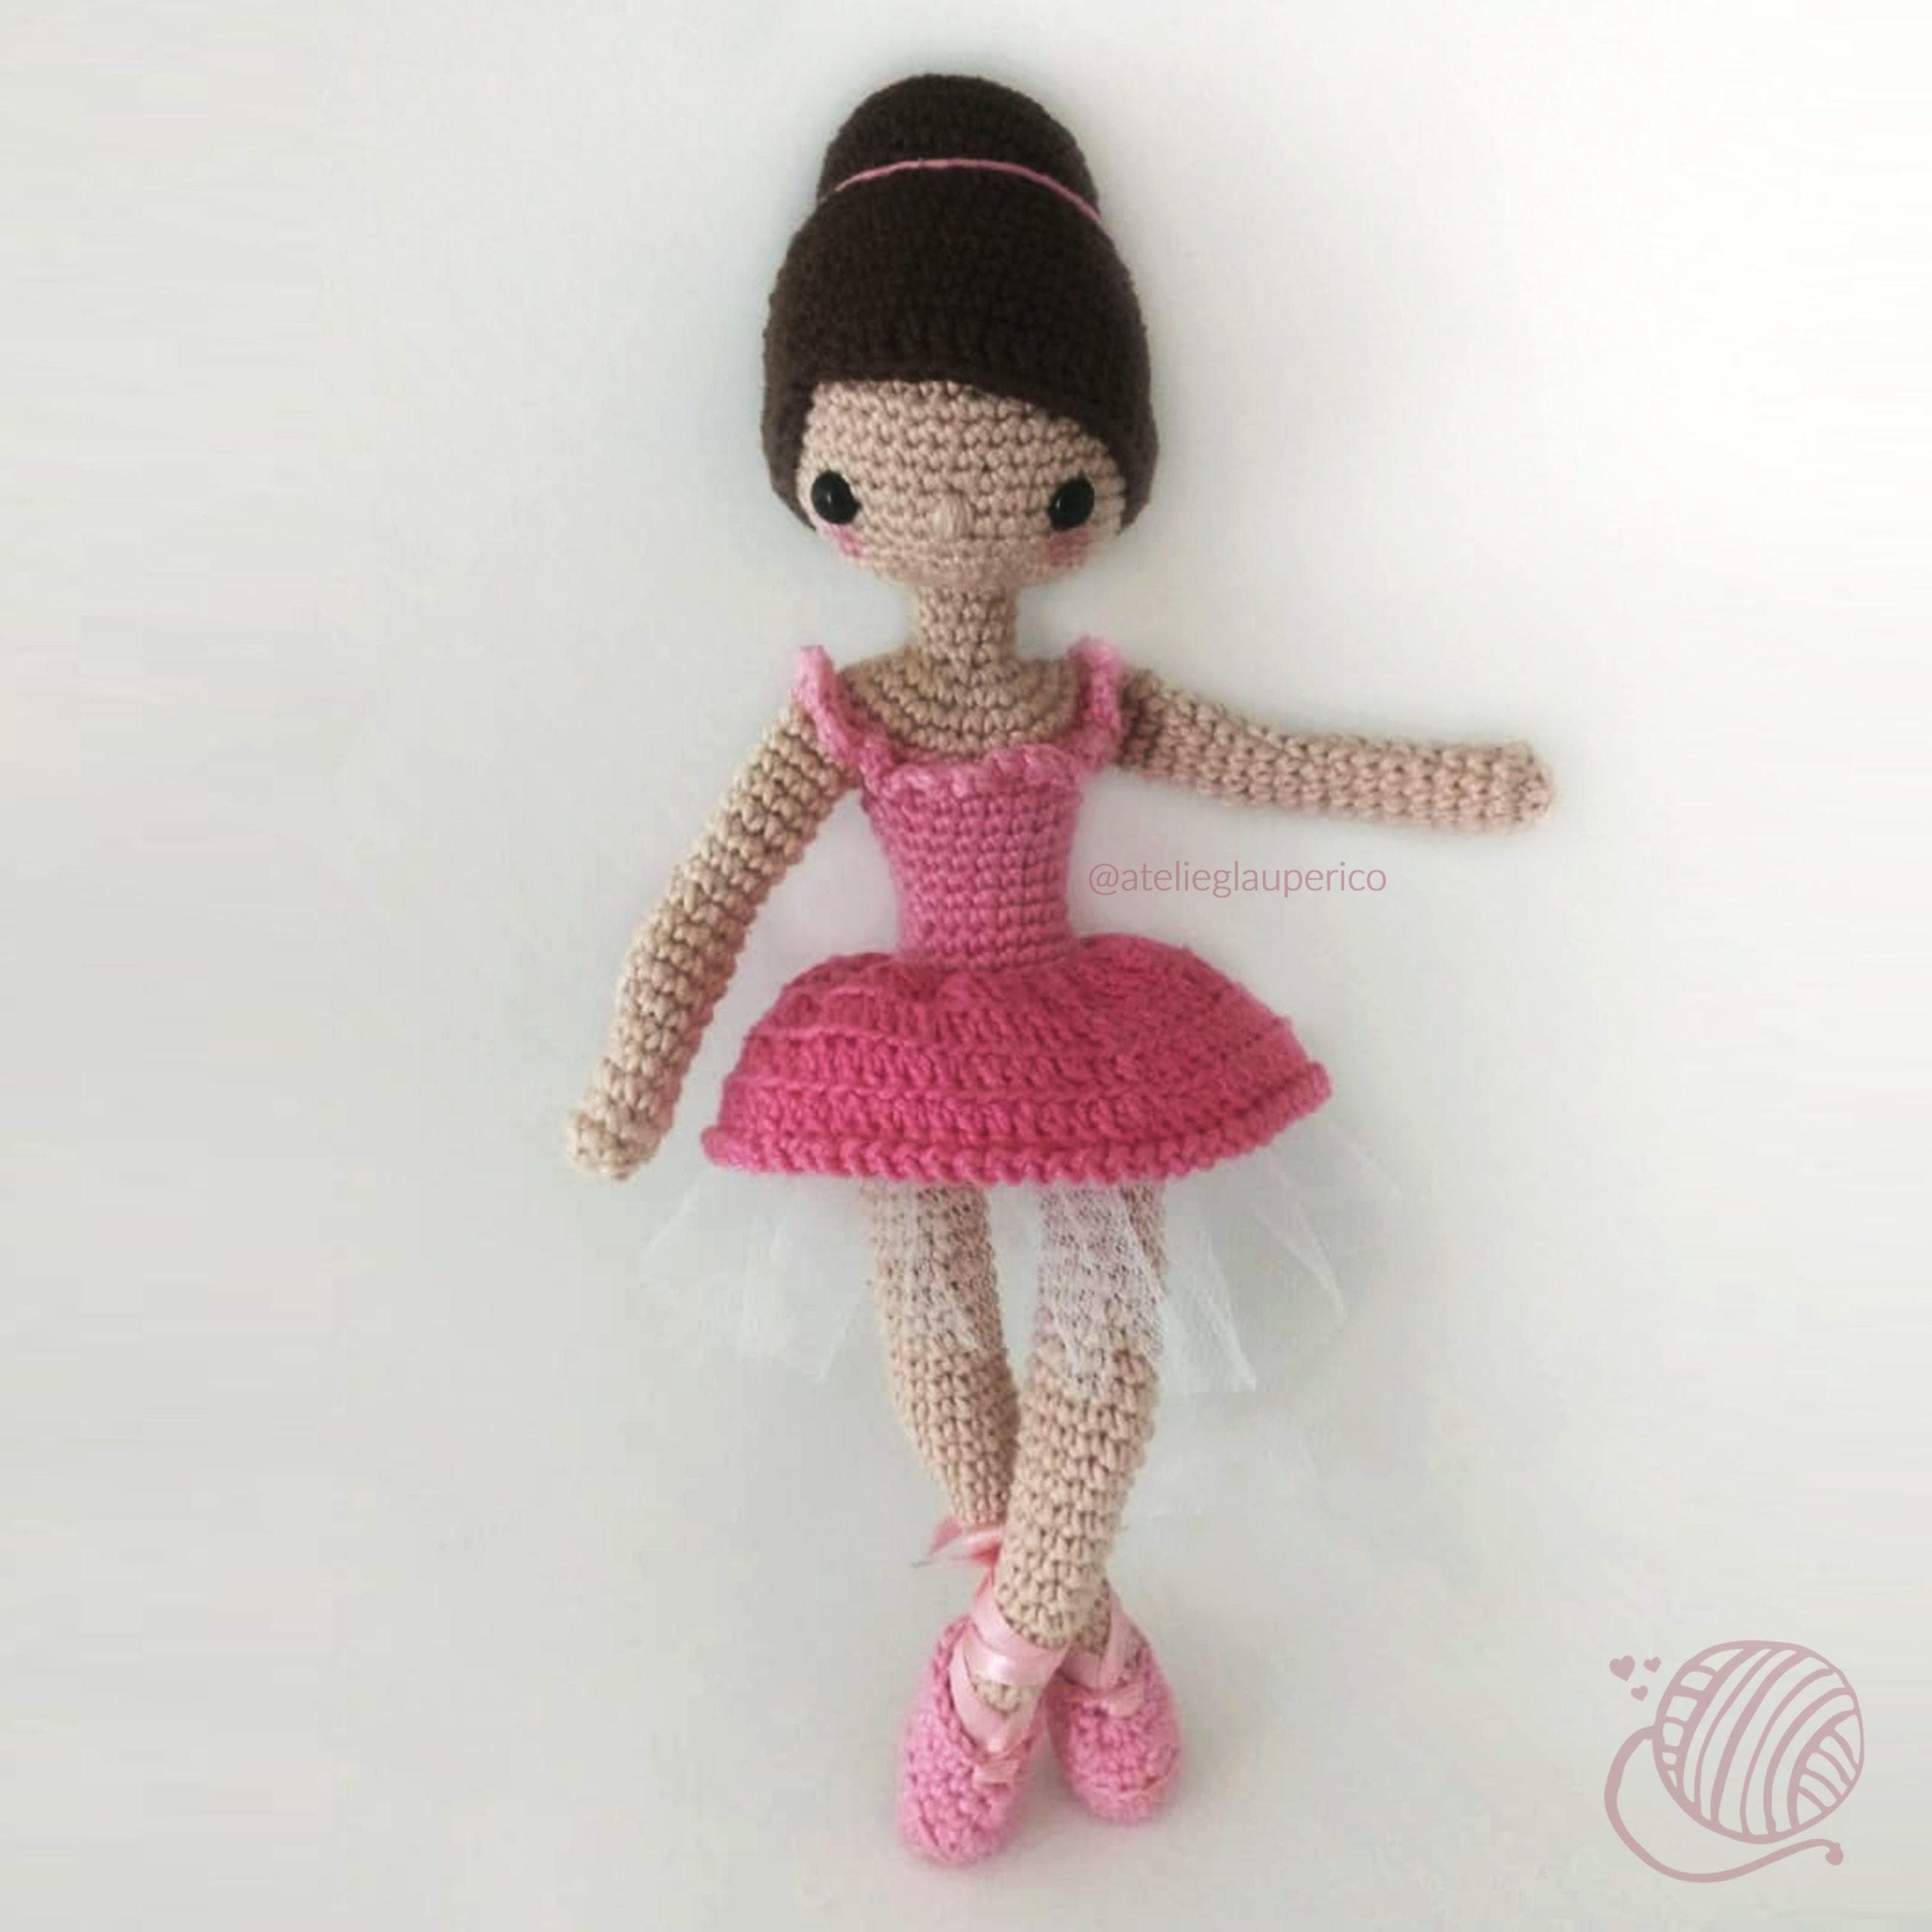 Leve Junto! 4 Kits Amigurumi Coleção Bailarinas - Círculo - R$ 135 ...   2560x2560